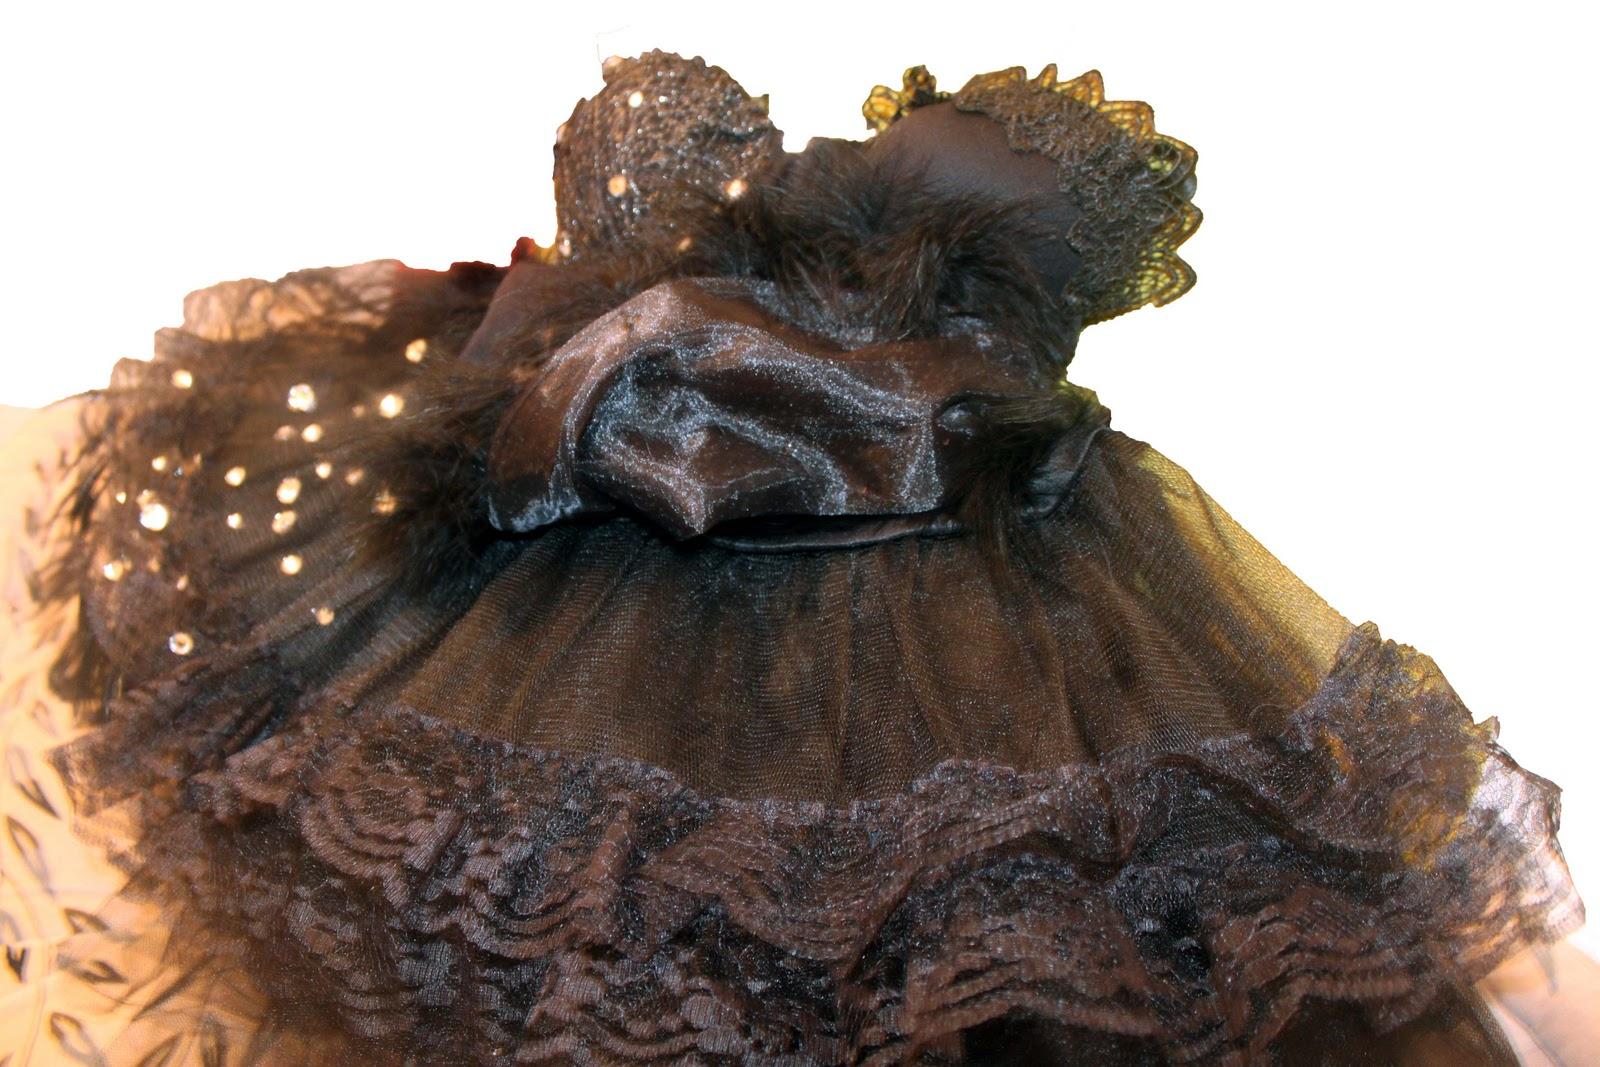 http://3.bp.blogspot.com/-u9wYw33D1xo/Tqx9GaJYypI/AAAAAAAADZY/HX-Y8LwxYV0/s1600/costume.jpg